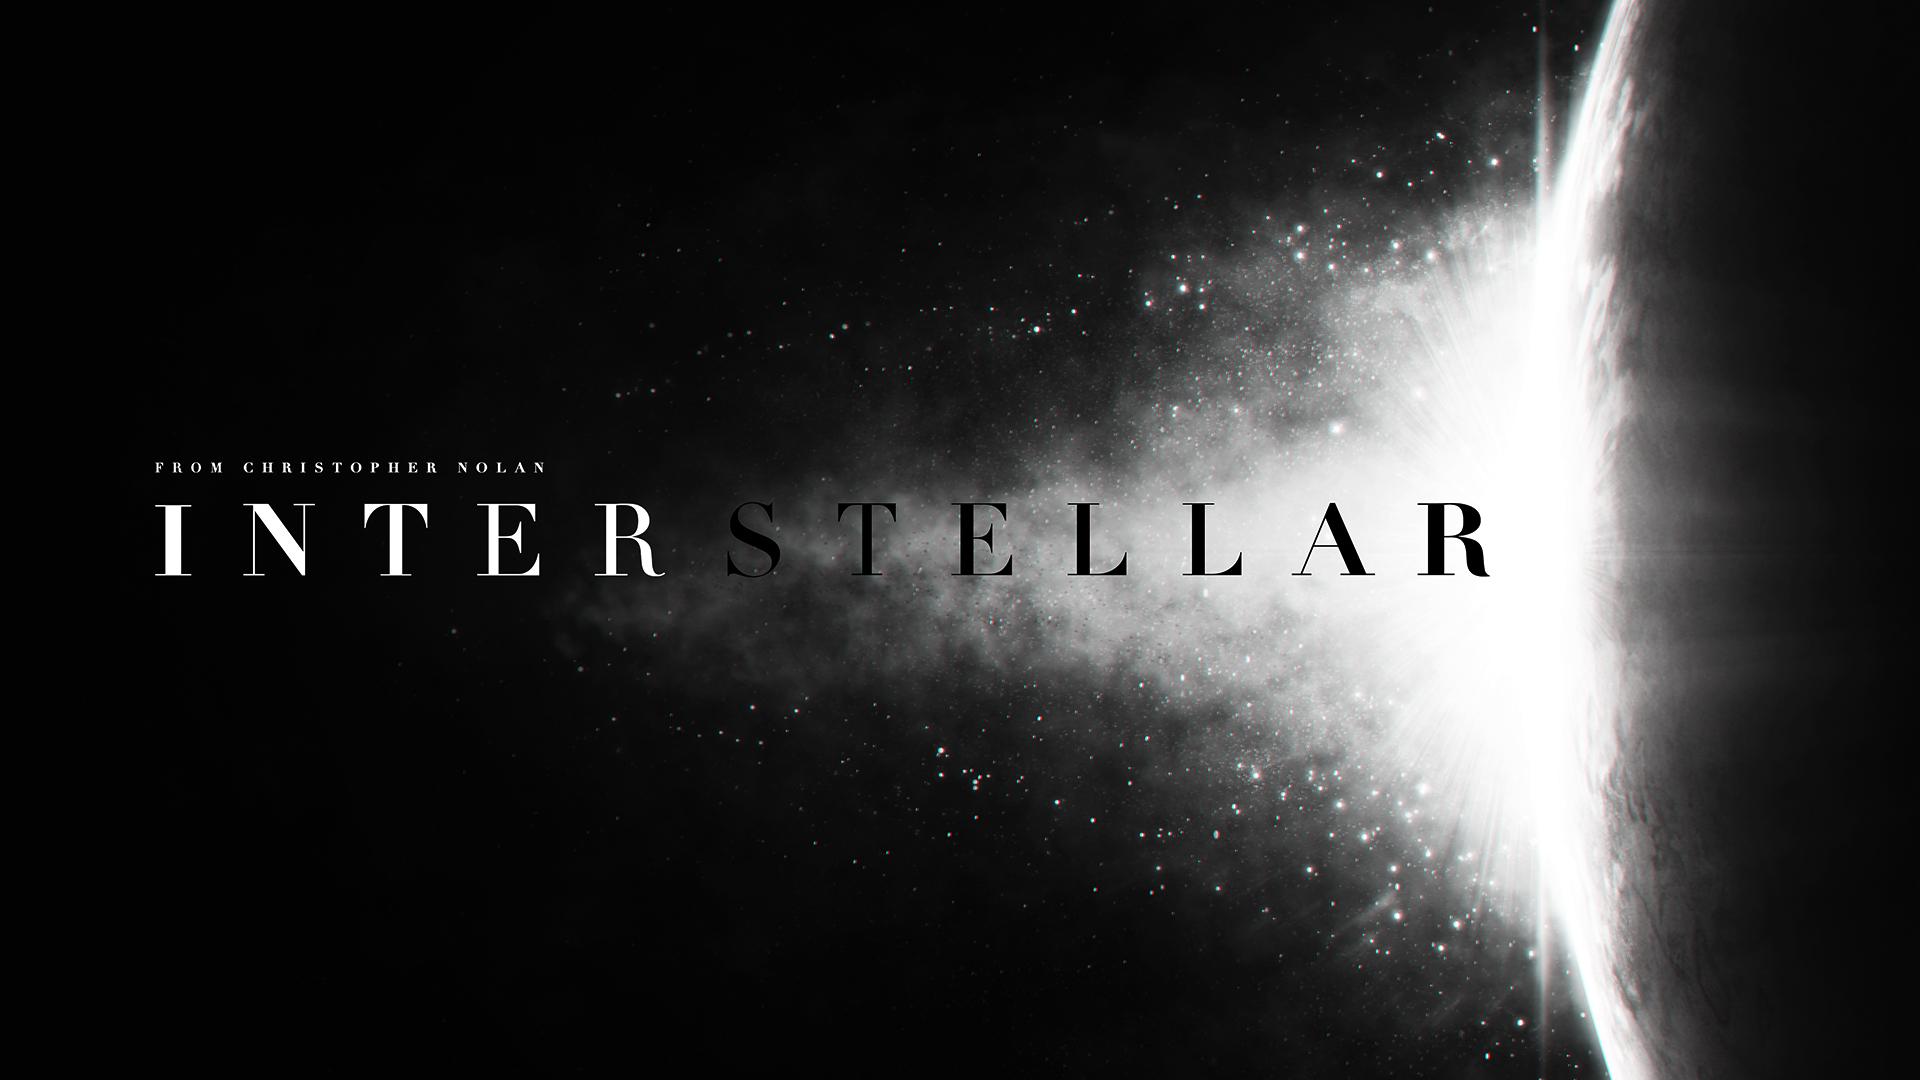 Interstellar Nolan Wallpaper Trailer For Nolan's Sci-fi